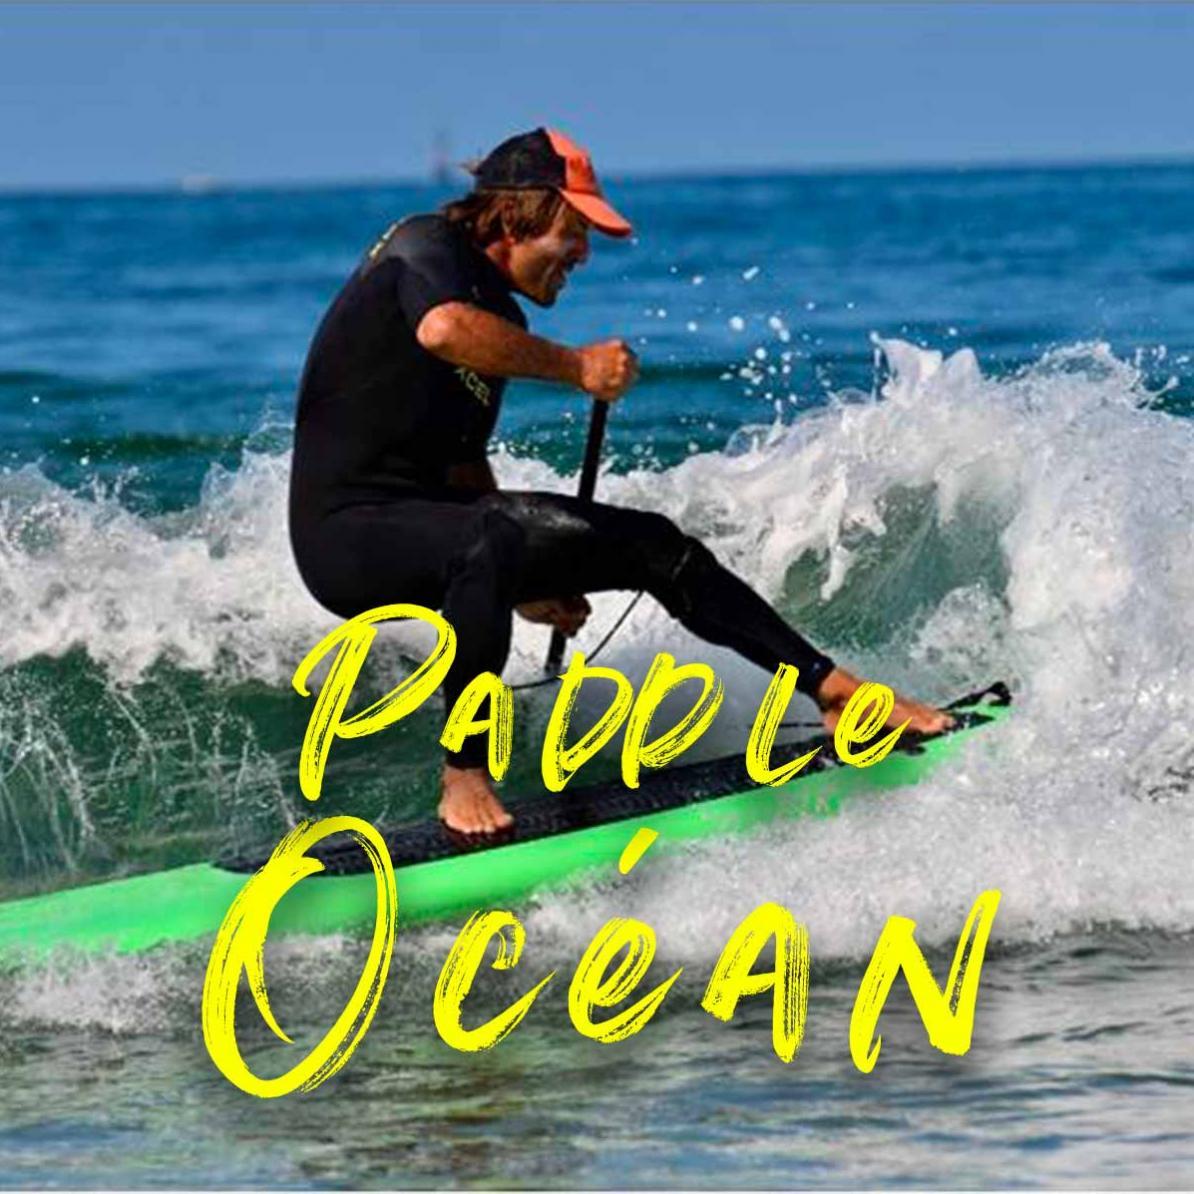 Paddle-océan